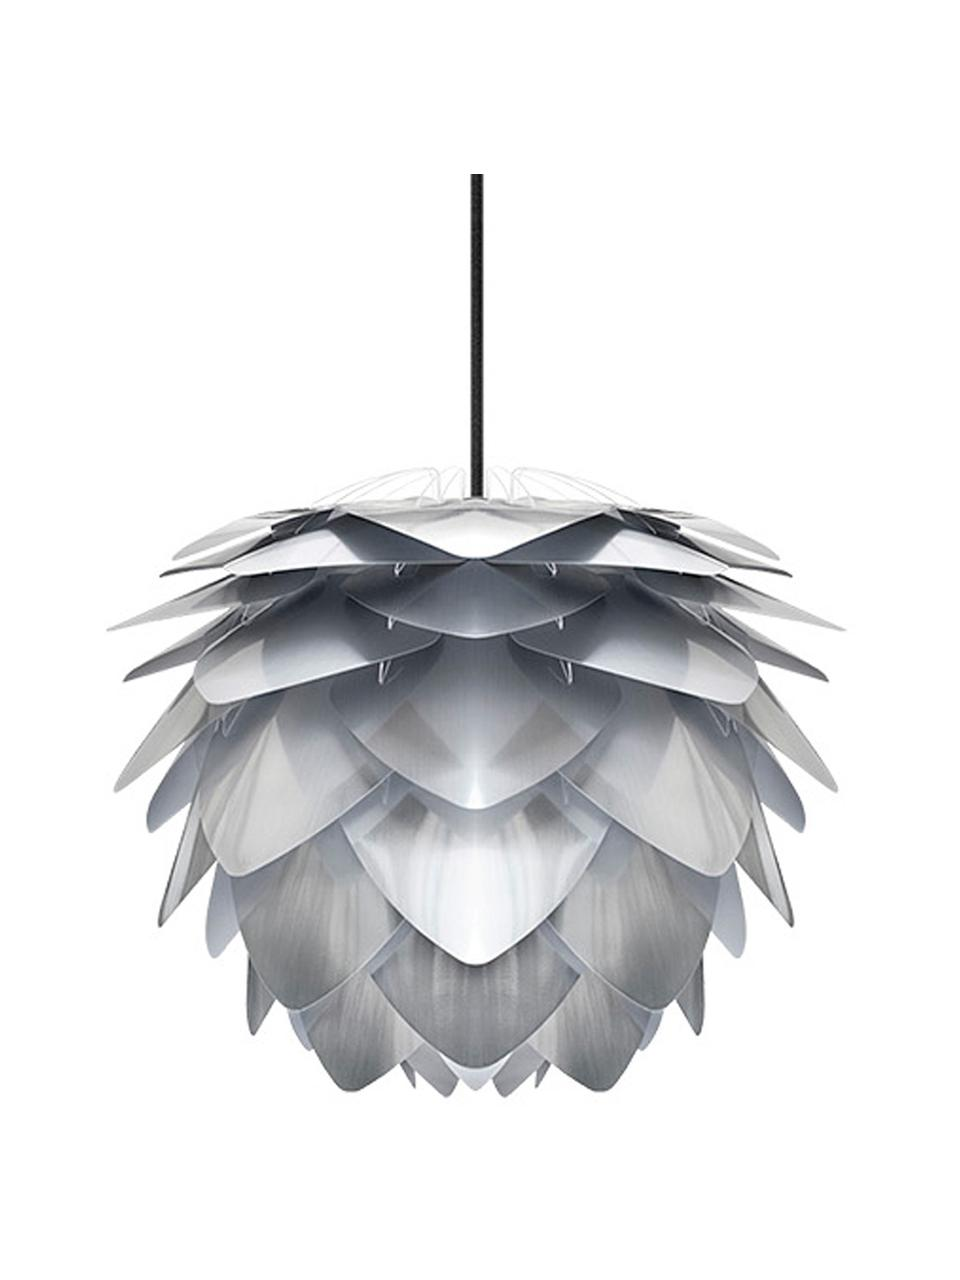 Lampada a sospensione Silvia, Paralume: polipropilene, Baldacchino: materiale sintetico, Grigio argento, Ø 32 x Alt. 25 cm